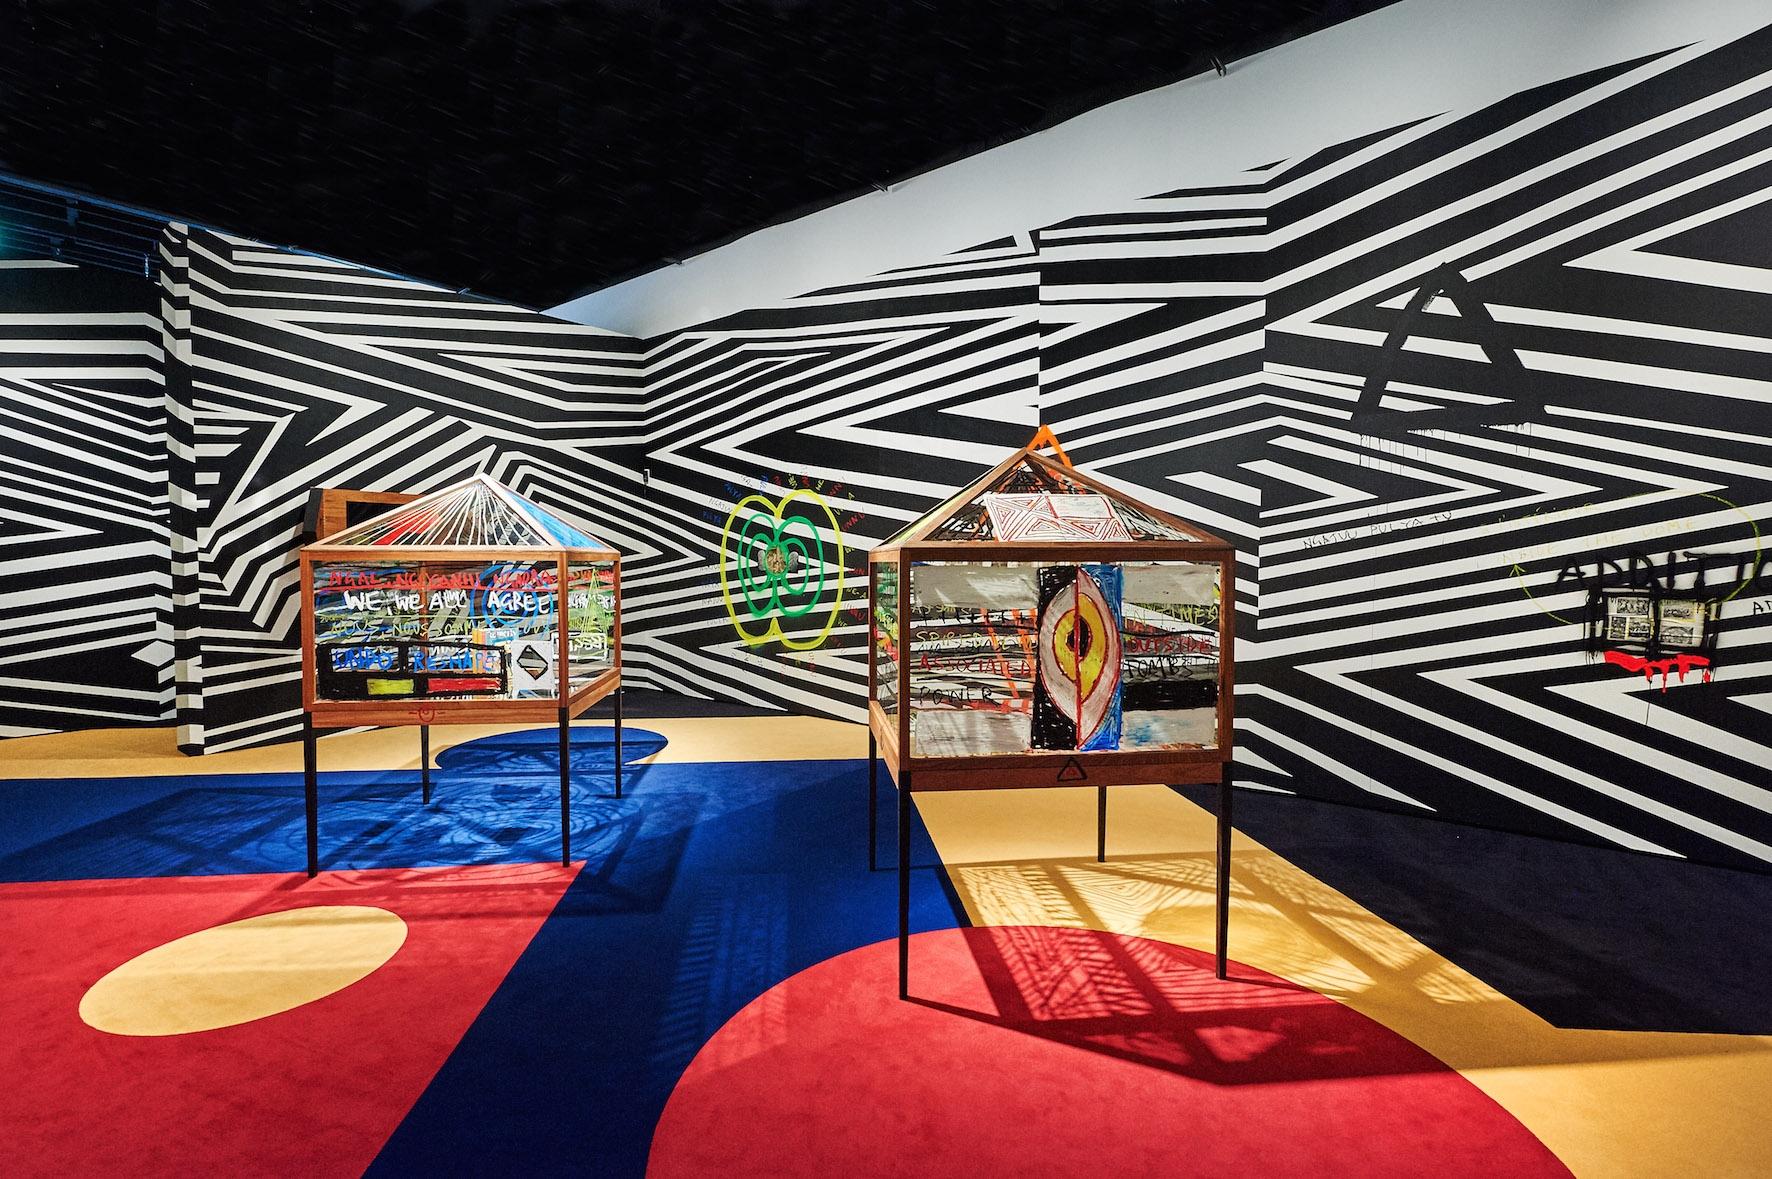 55 Exposition «L'effet boomerang. Les arts aborigènes d'Australie»